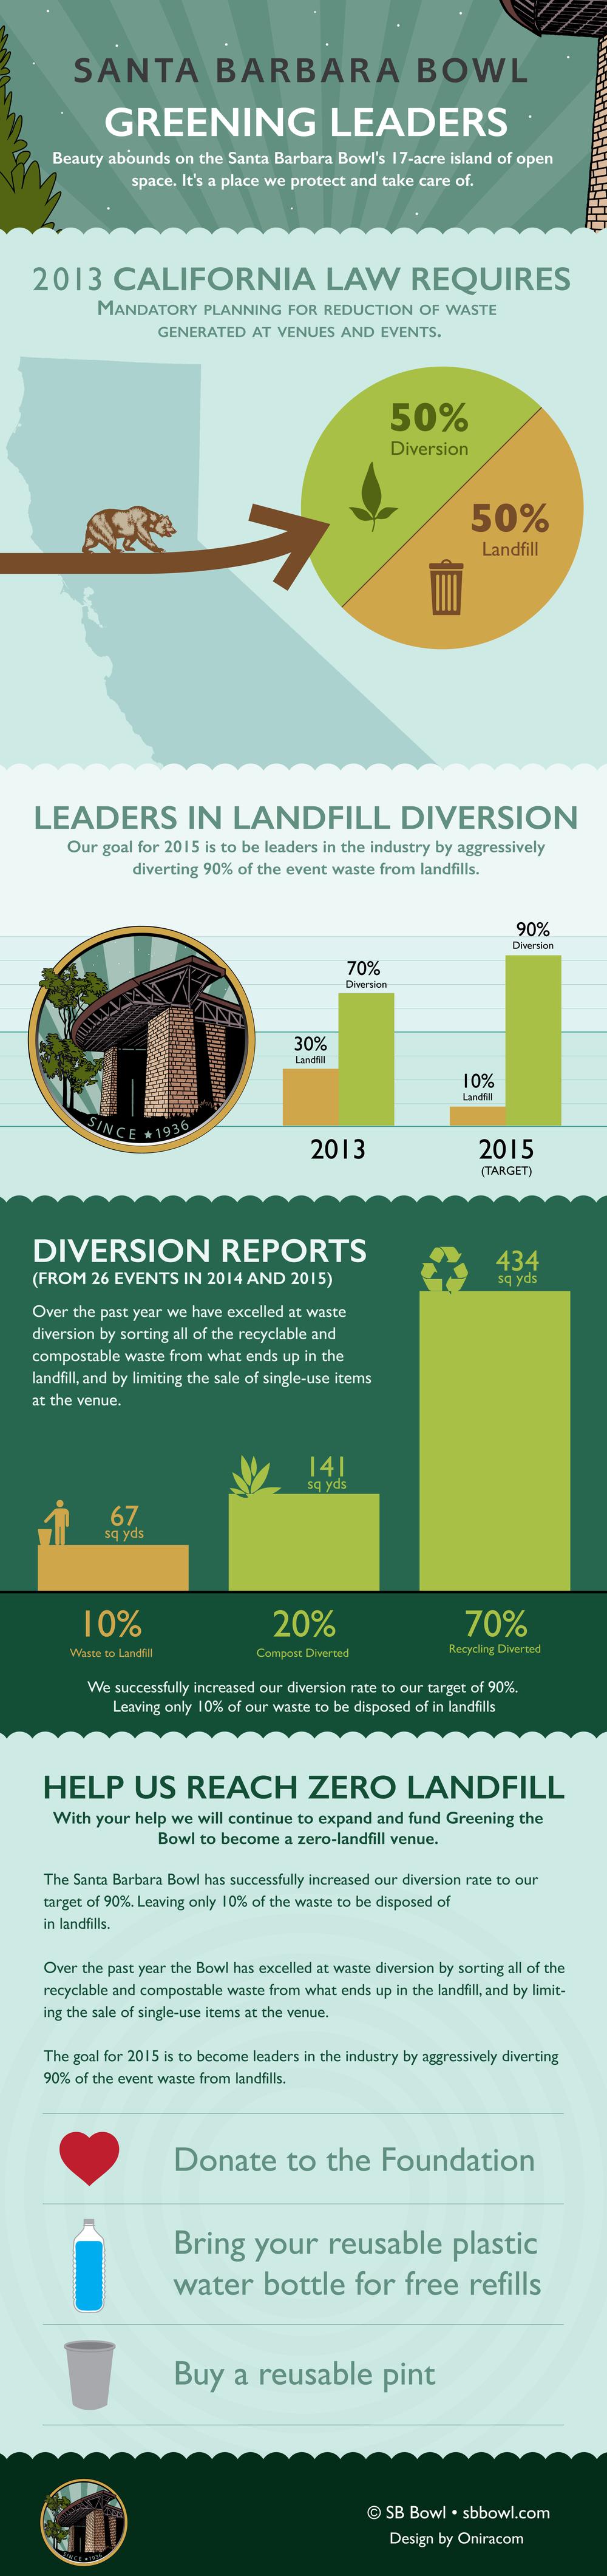 Oniracom_DesignComp_SBBowl_Infographic_V3.jpg